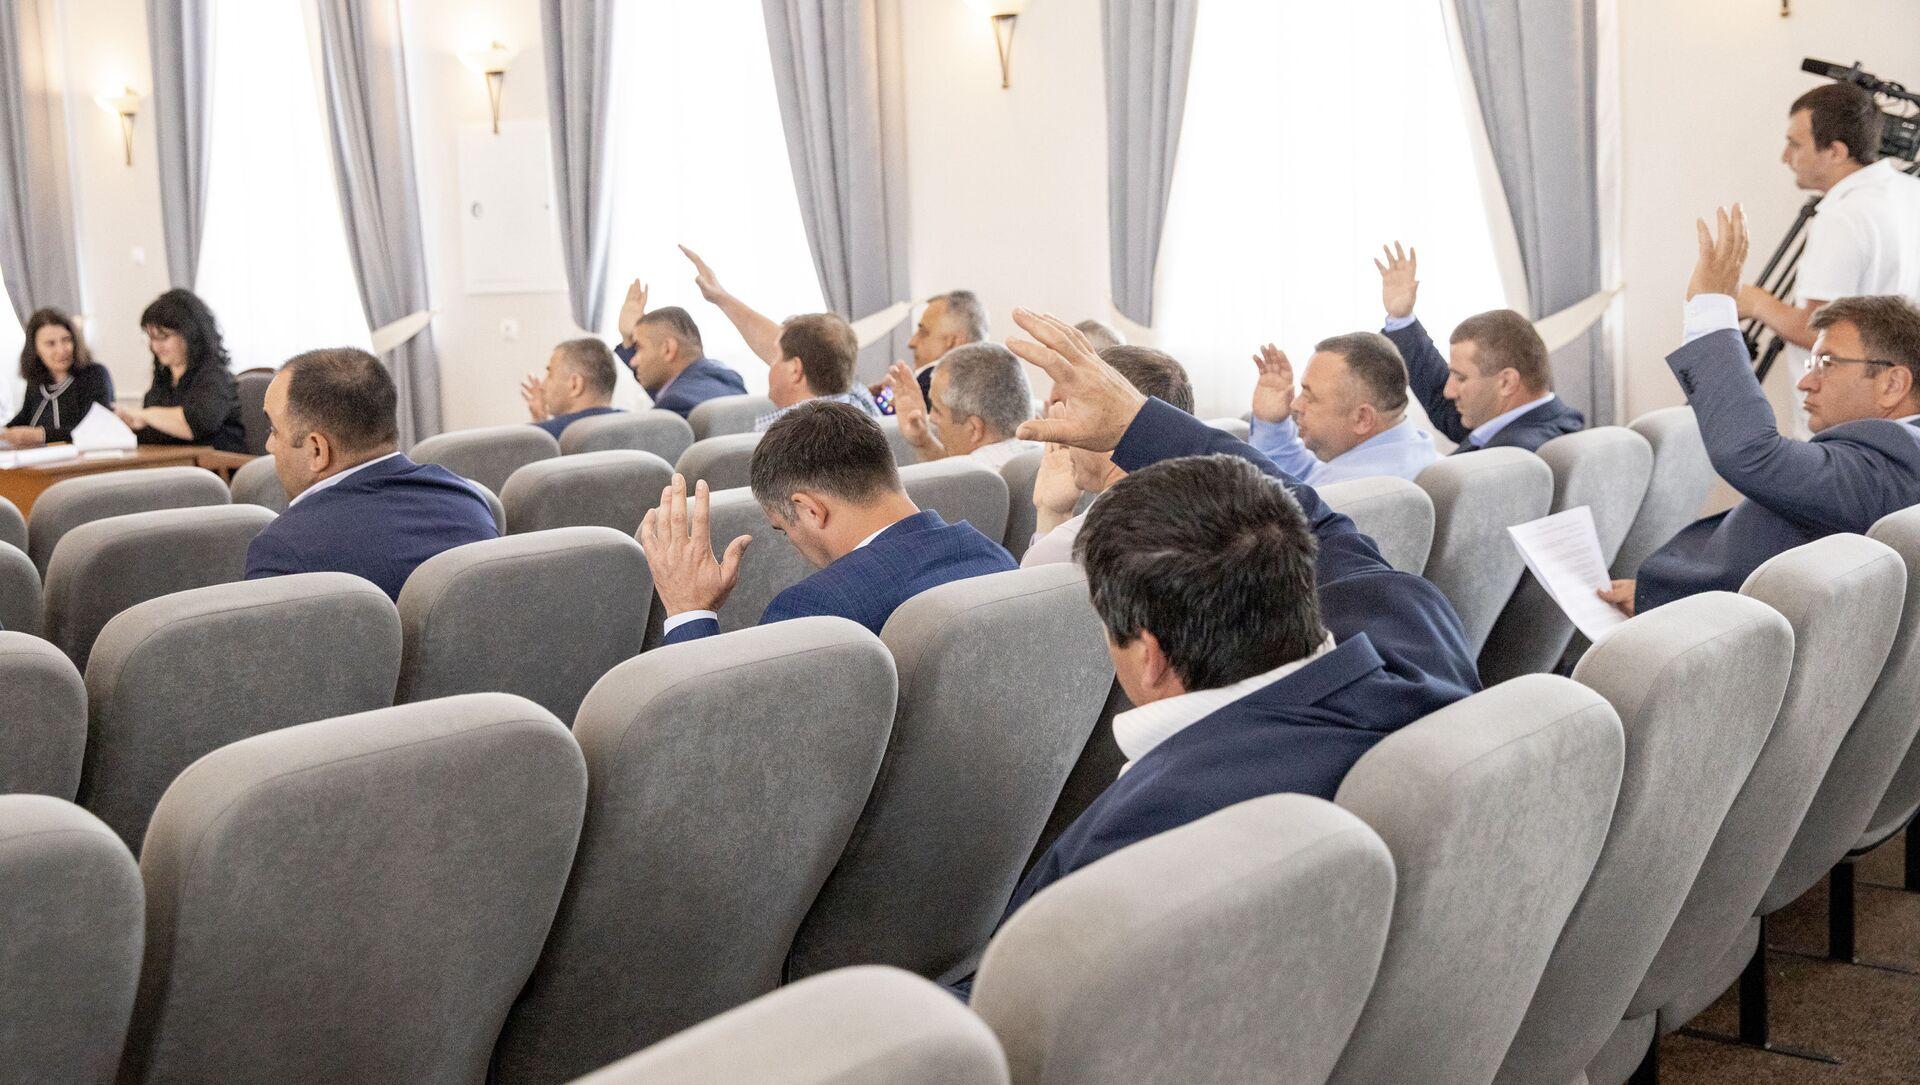 Сессия Парламента - Sputnik Южная Осетия, 1920, 14.07.2021